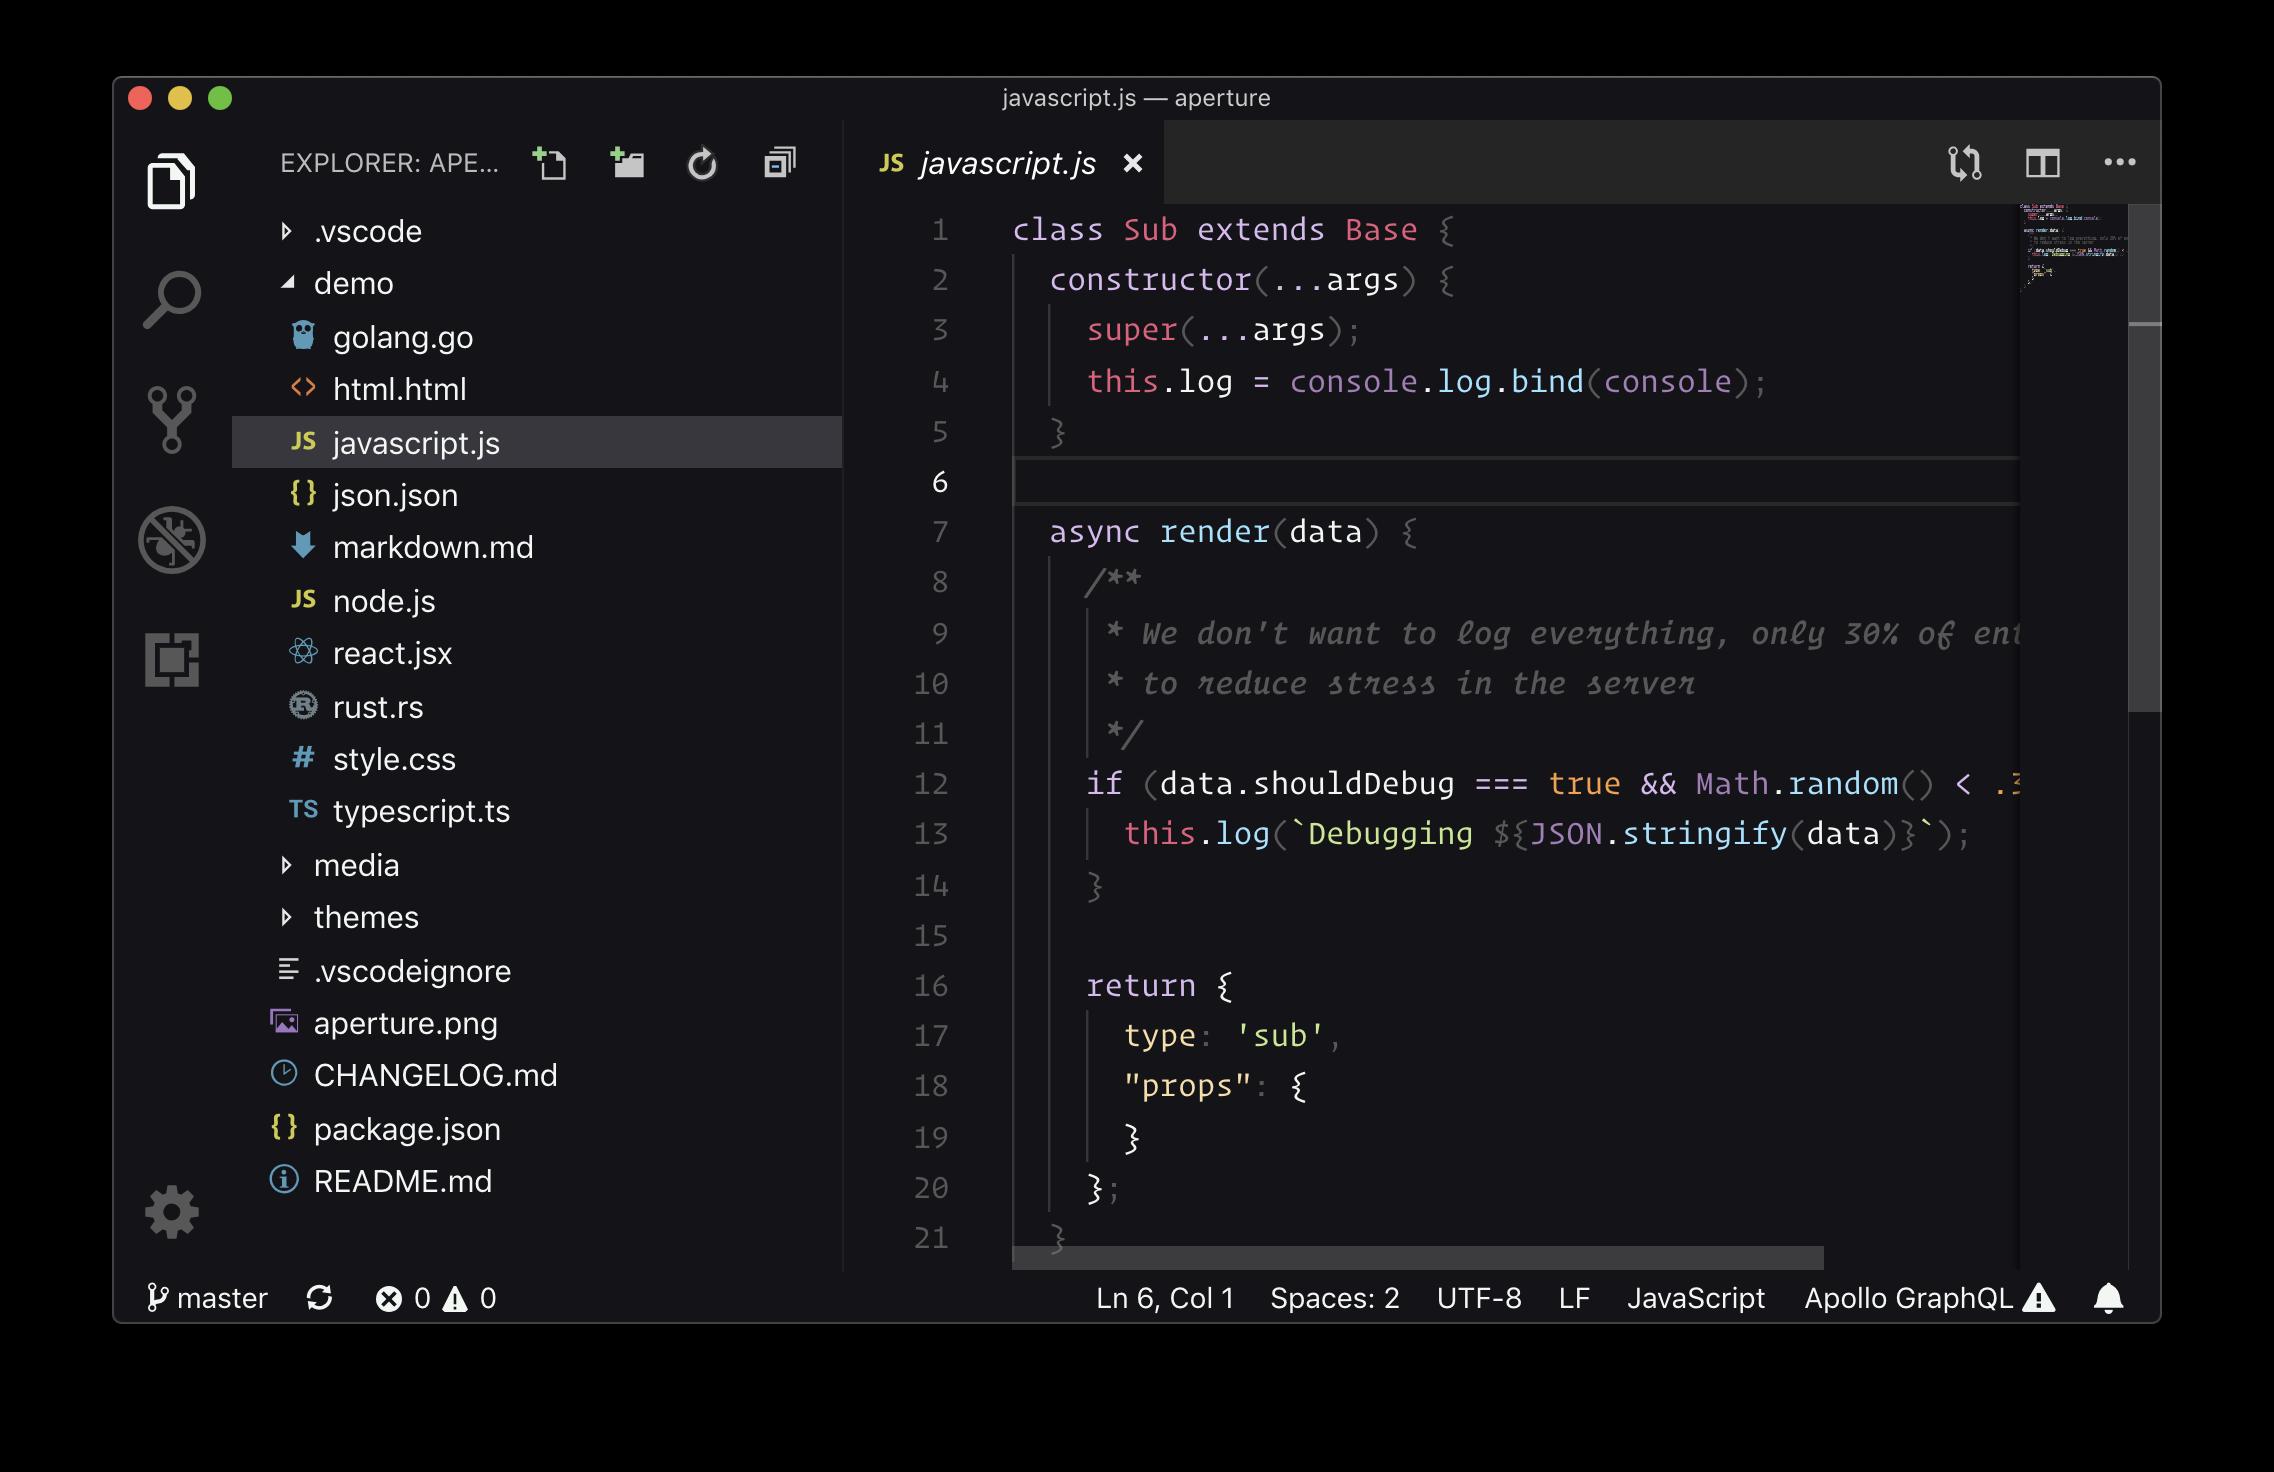 Large Aperture Editor Theme Screenshot